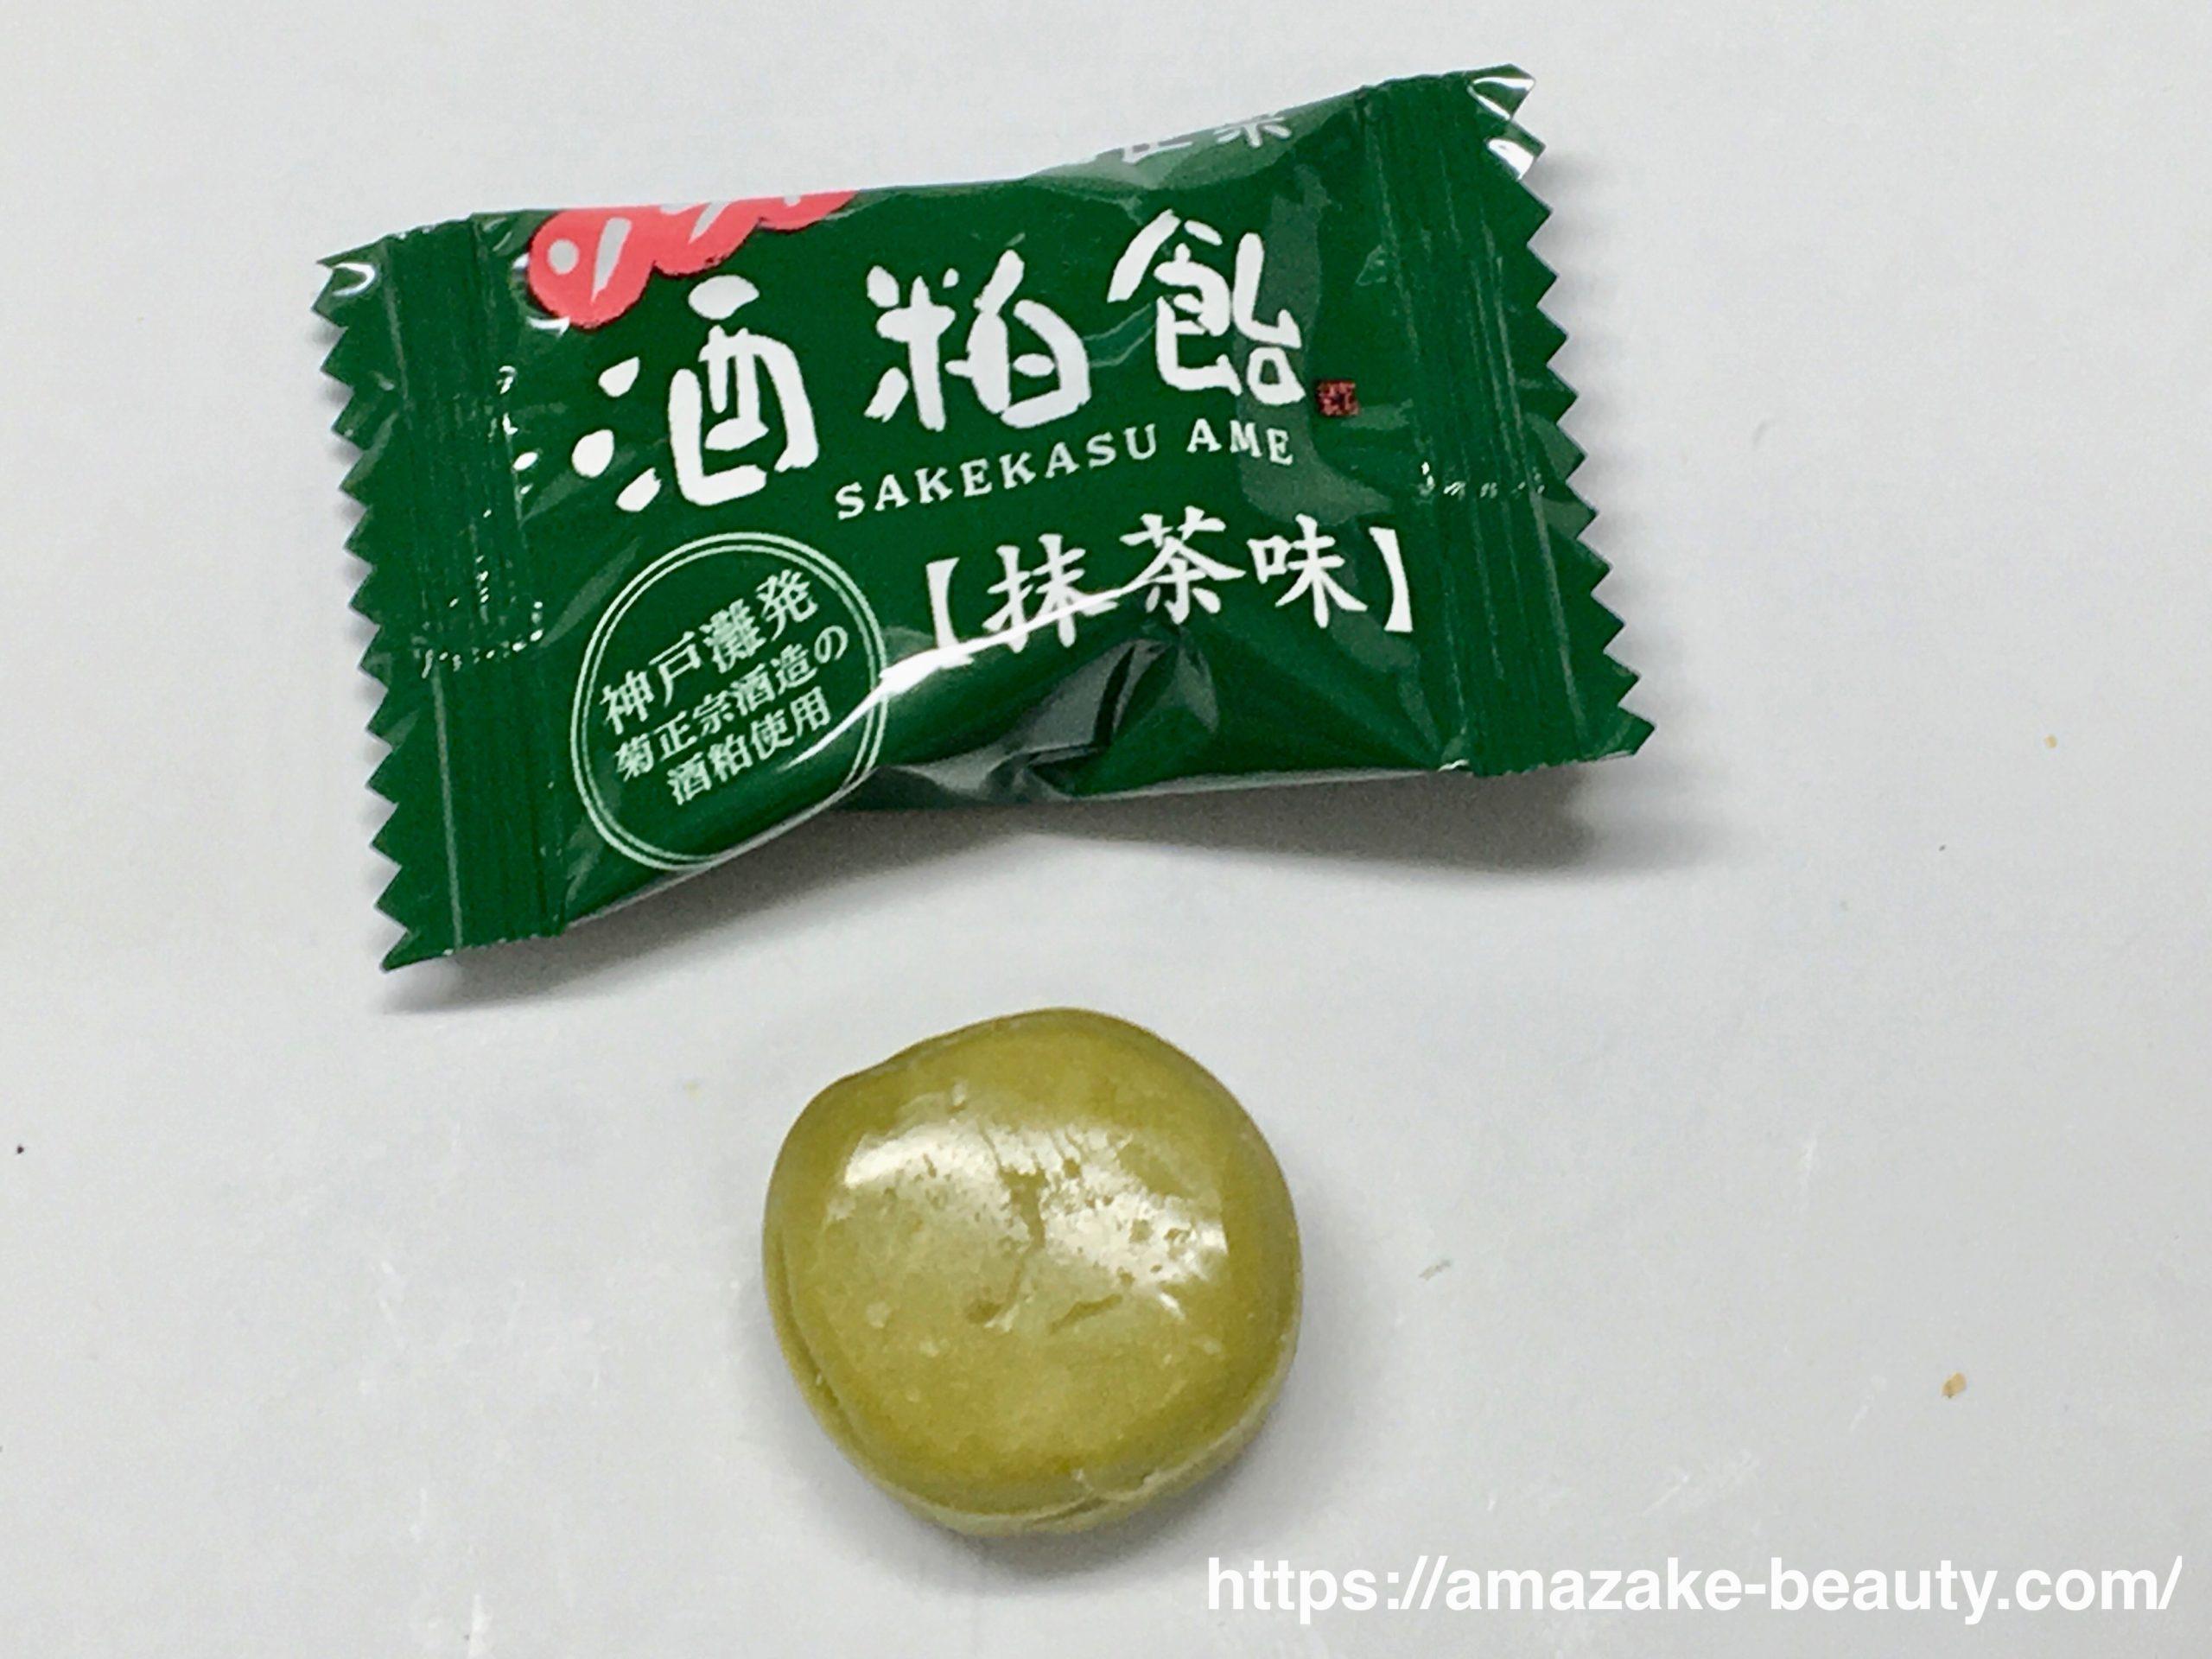 【甘酒甘味】菊正宗『ソフト酒粕飴(抹茶味)』(食べた感想)